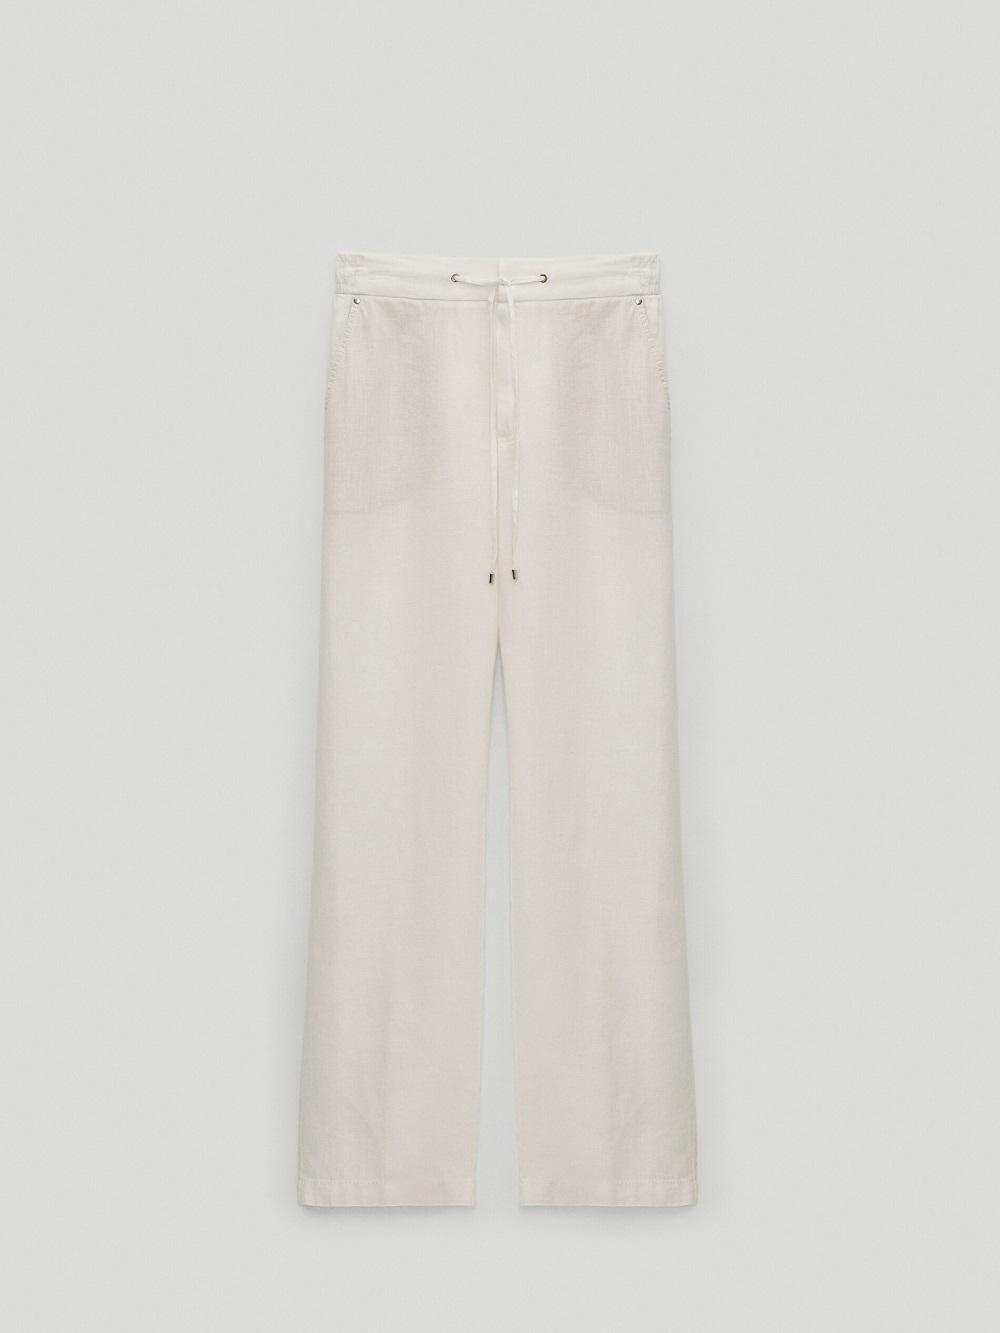 Massimo Dutti Linen Collection proljeće 2021.